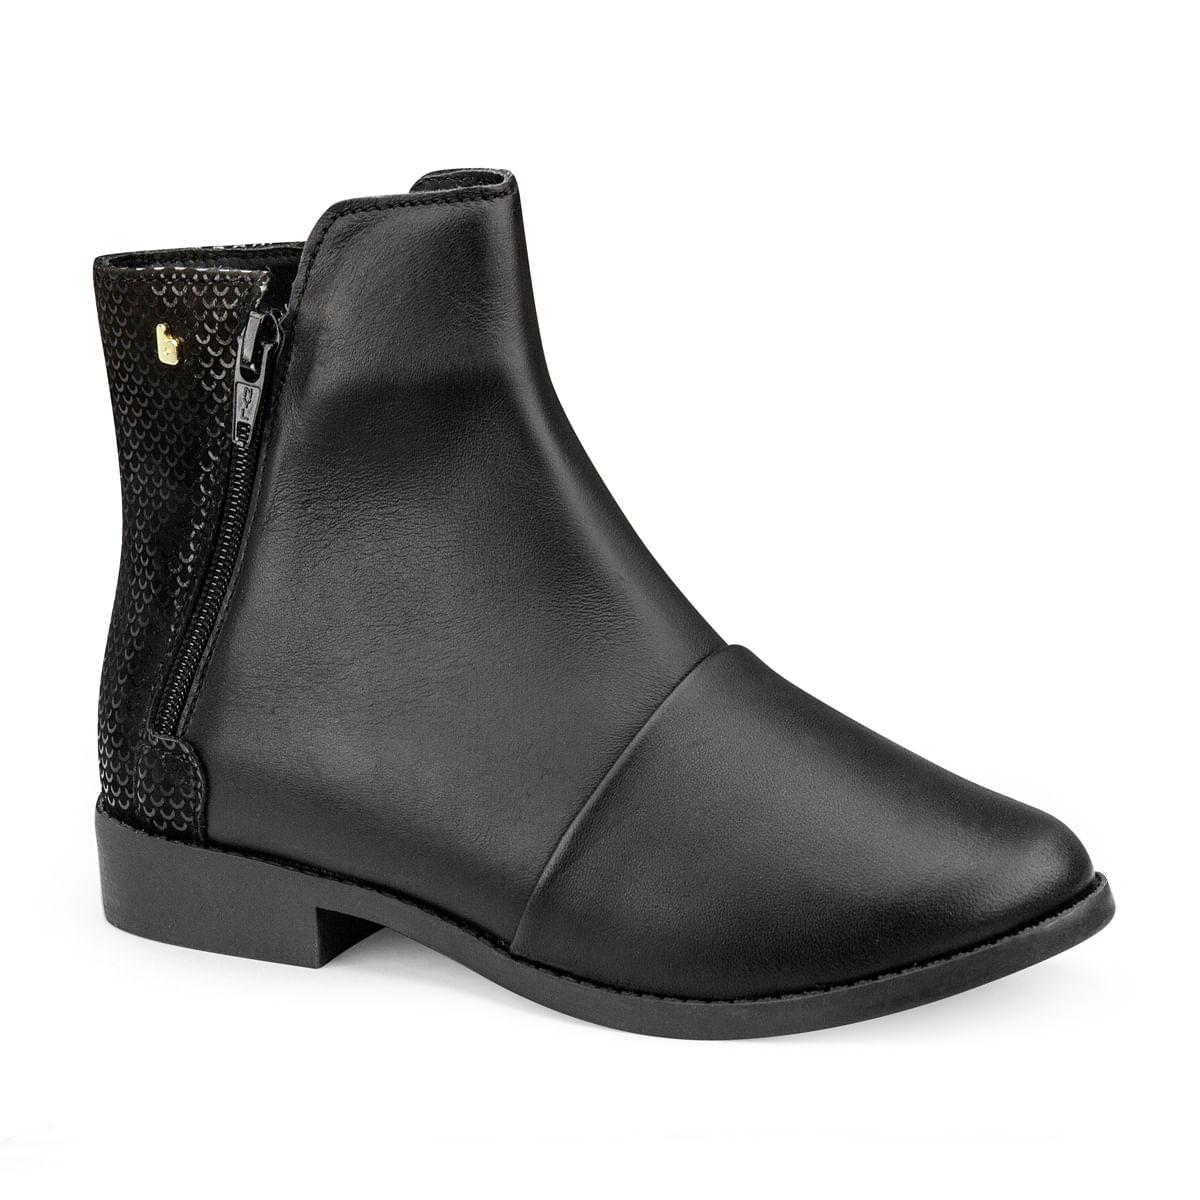 5ef9aef3854 Bota Infantil Bibi Feminina Preta Classic Boots 1085010 - Bibi Calçados